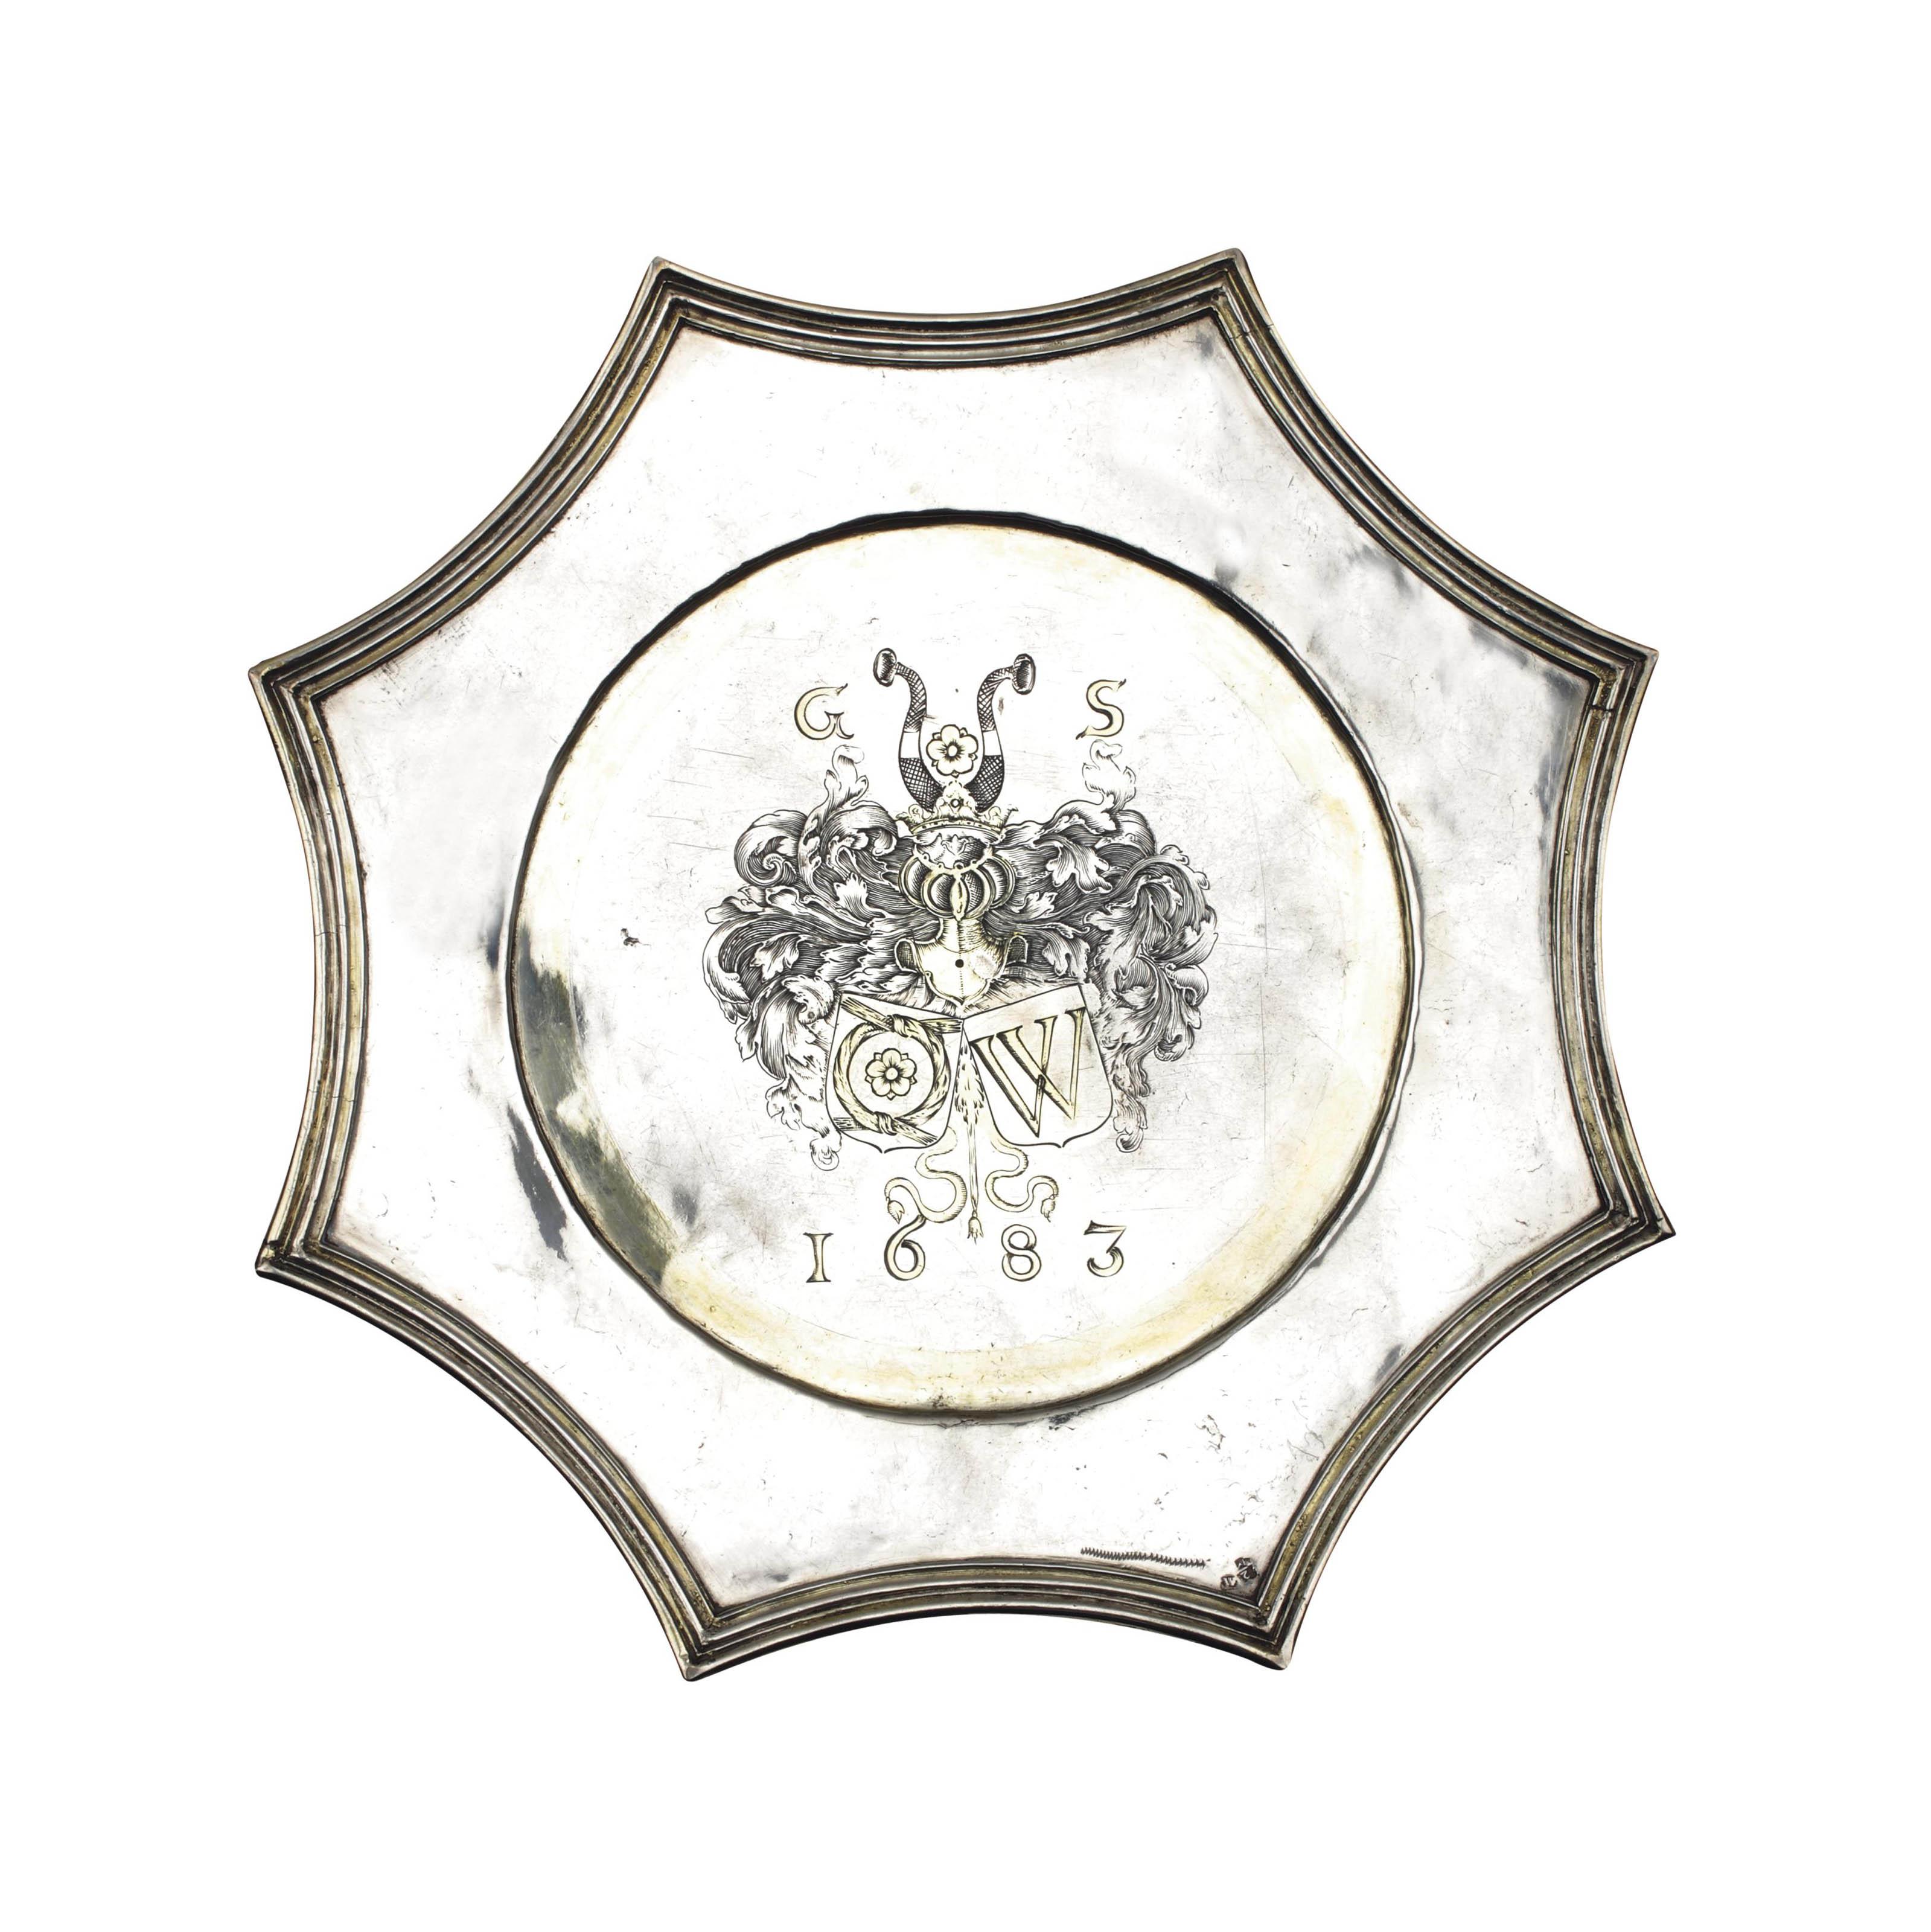 A rare Dutch silver pointed dish, puntschotel